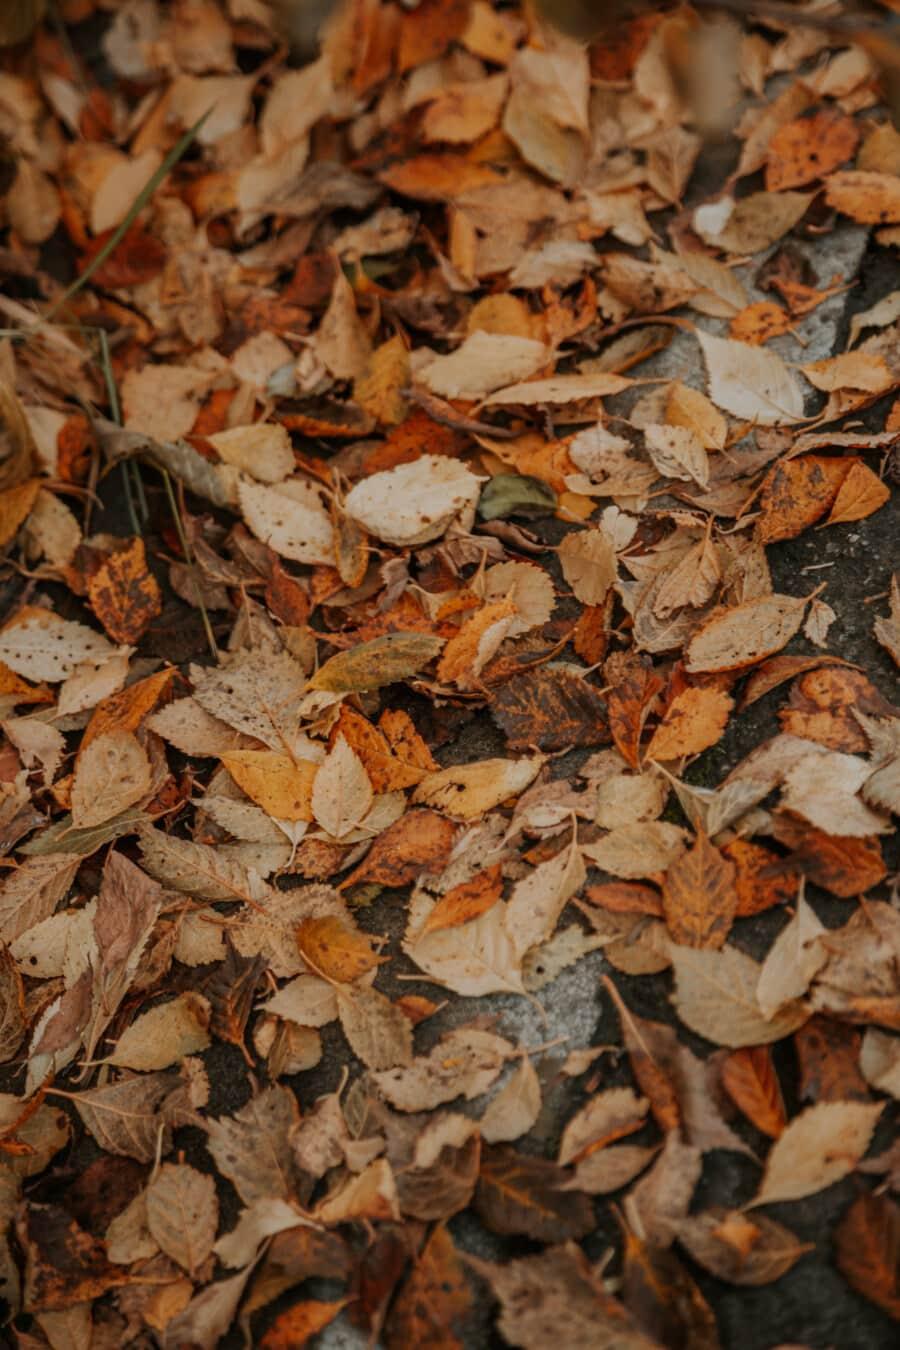 trocken, Blatt, Blätter, Trockenzeit, Herbst, Muster, Oktober, aus nächster Nähe, Textur, Natur